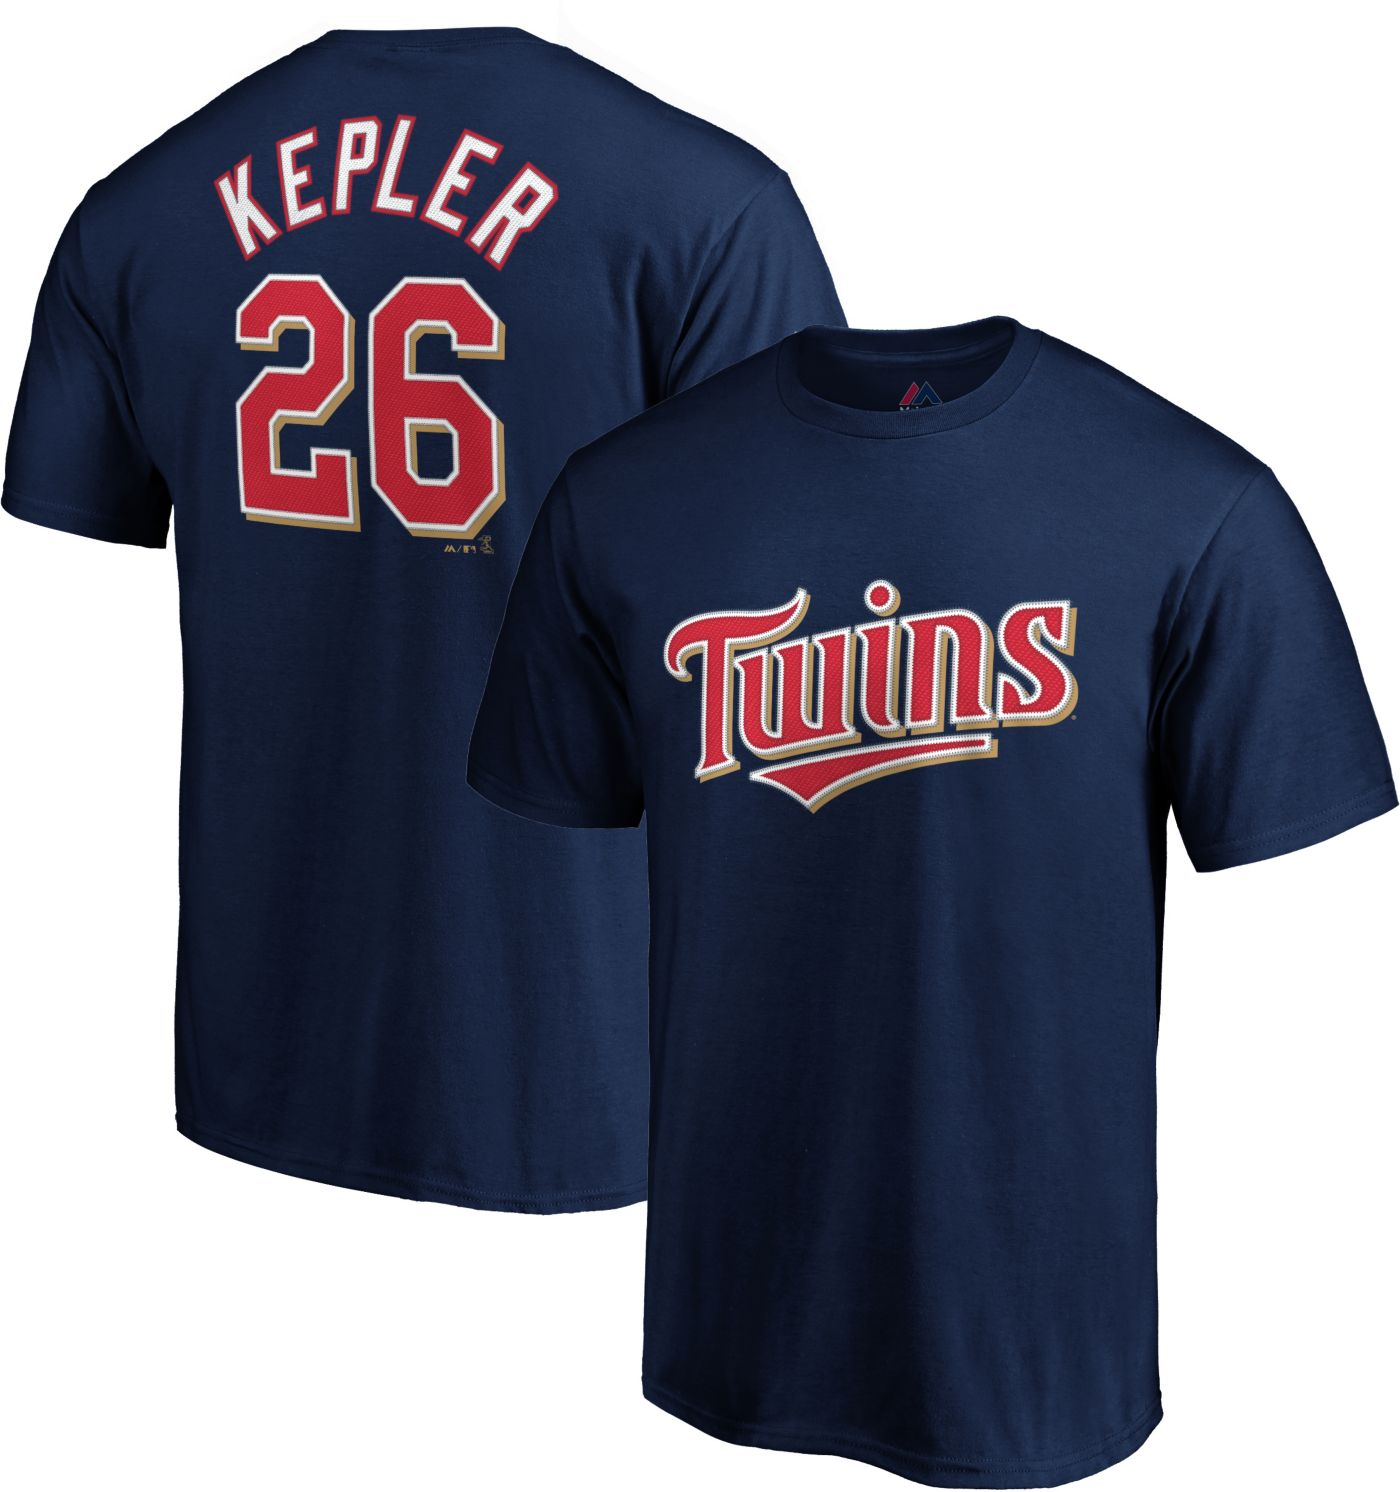 Majestic Youth Minnesota Twins Max Kepler #26 Navy T-Shirt